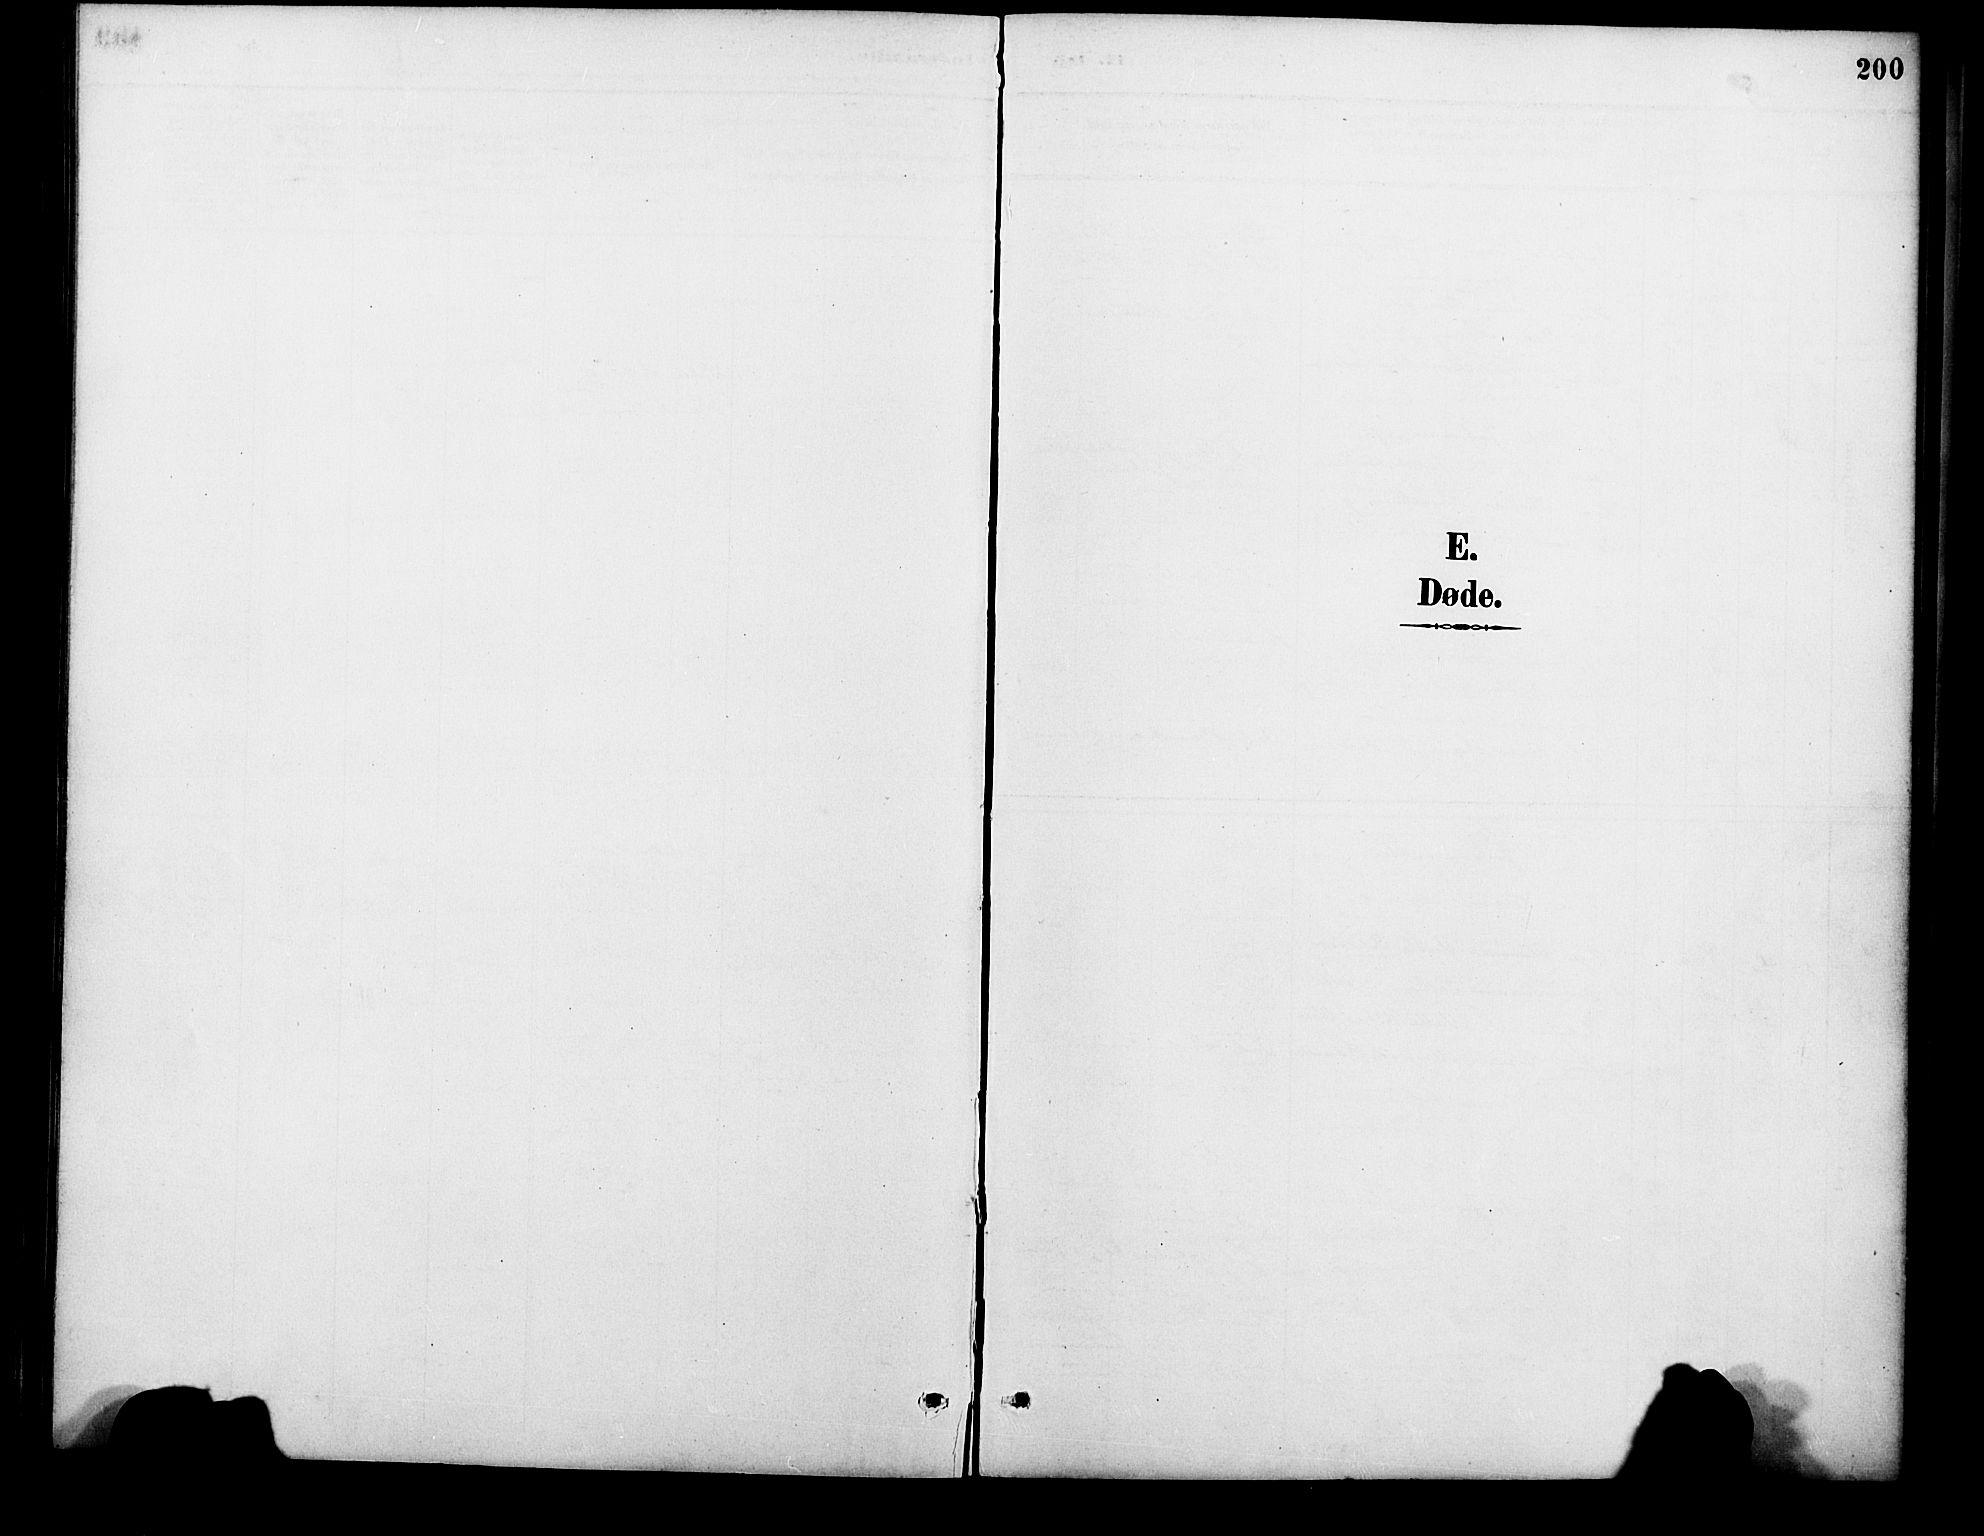 SATØ, Lenvik sokneprestembete, H/Ha: Ministerialbok nr. 13, 1890-1898, s. 200